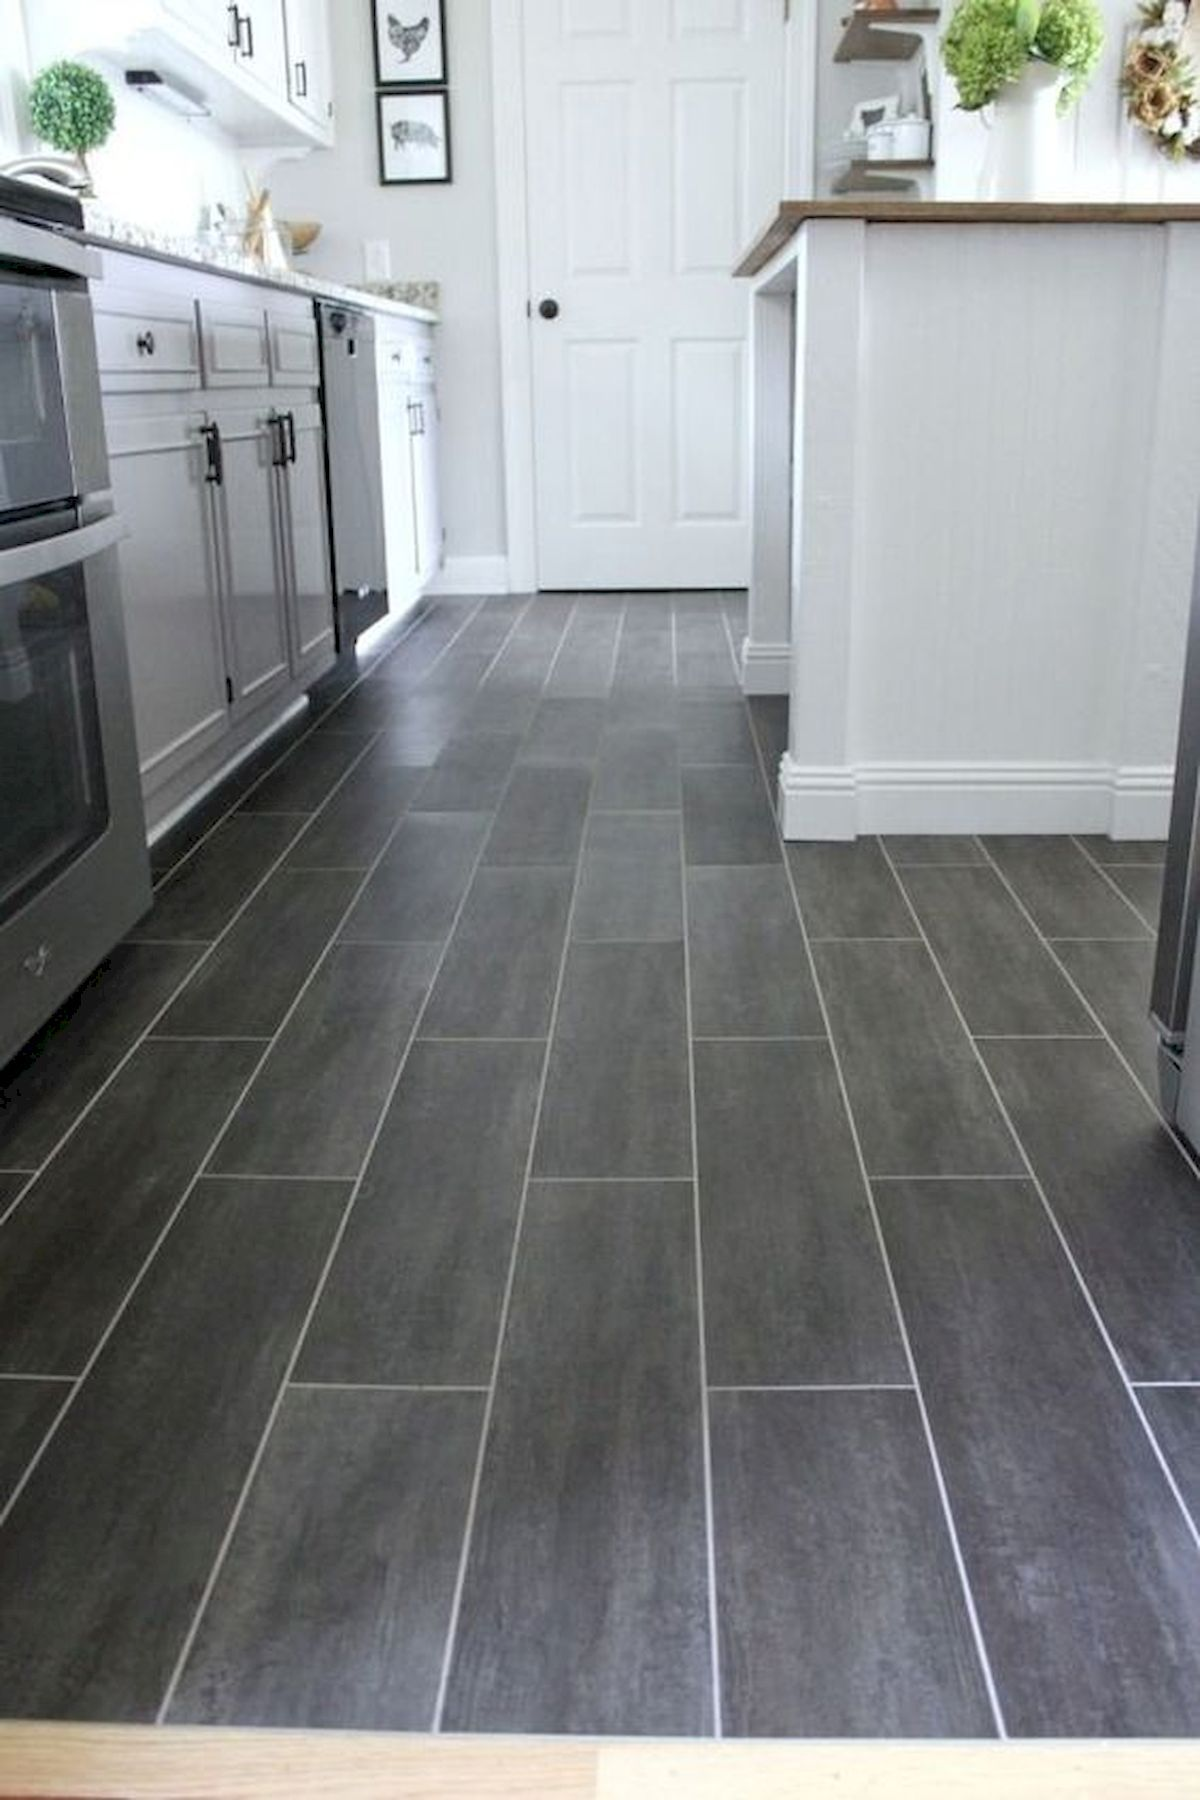 42 Awesome Tile Flooring Designs Ideas For Modern Kitchen In 2020 Diy Kitchen Flooring Kitchen Flooring Trends Diy Flooring